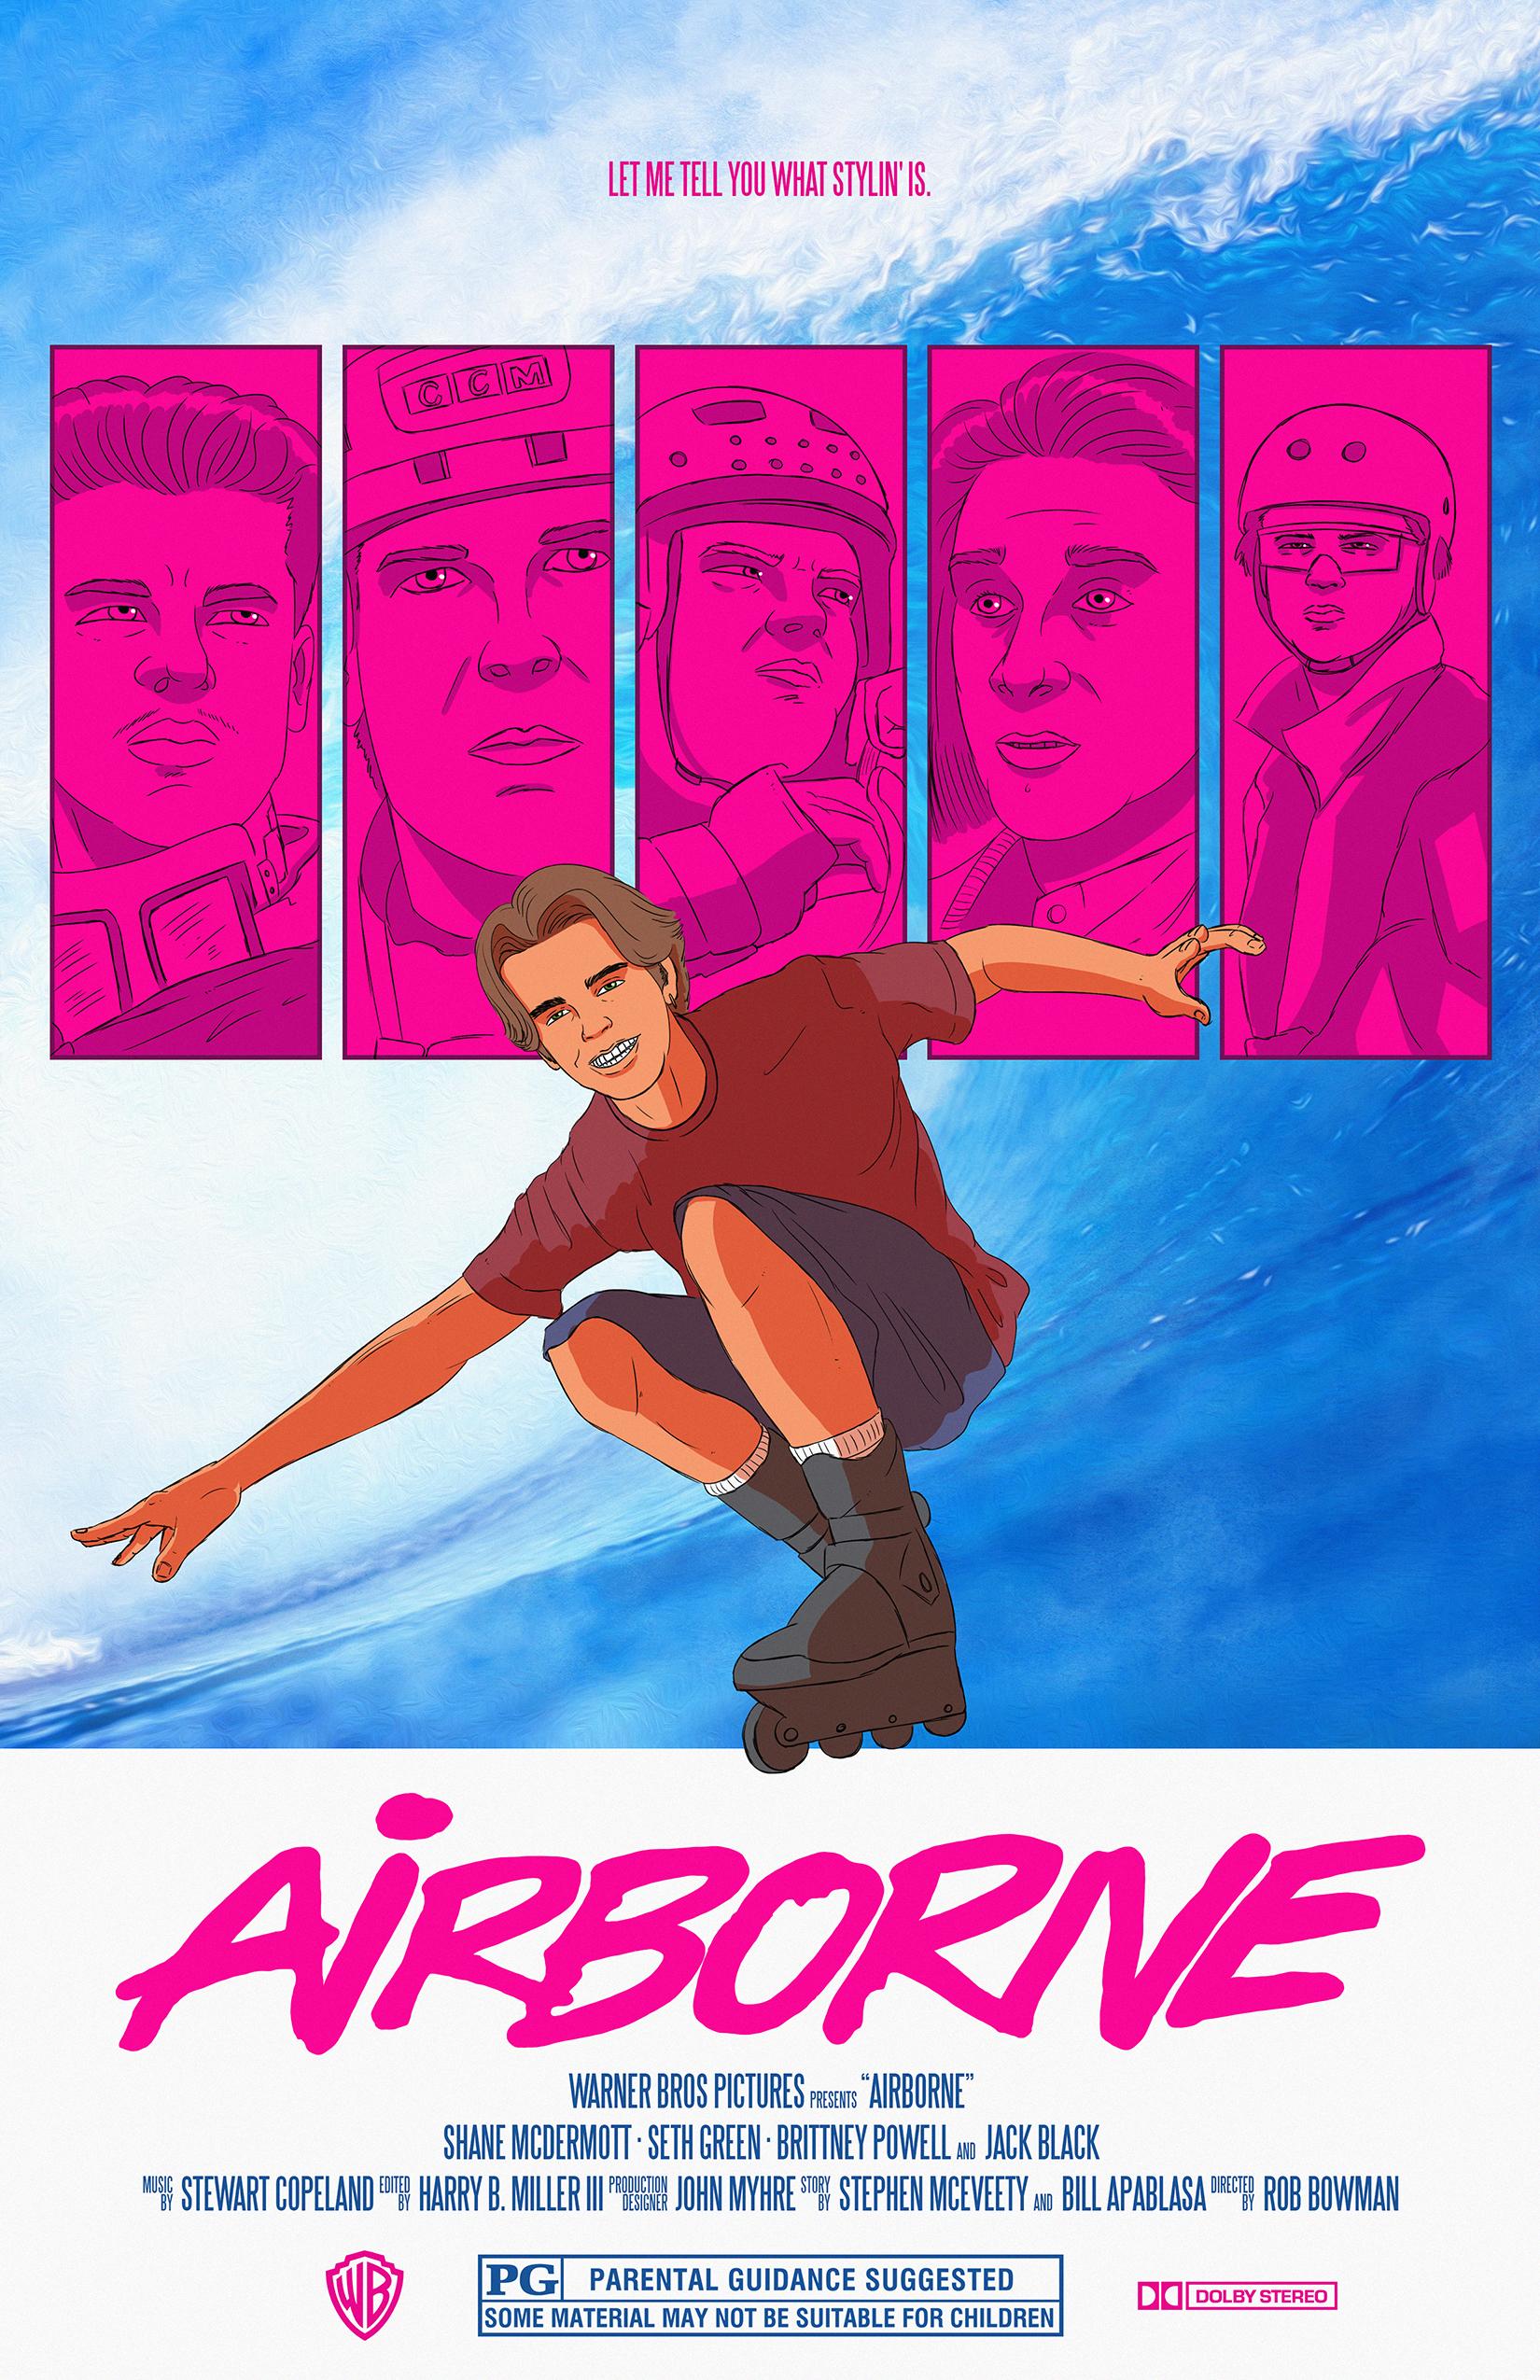 Jon-Caron-Airborne-Movie-Poster-JC-Art.jpg